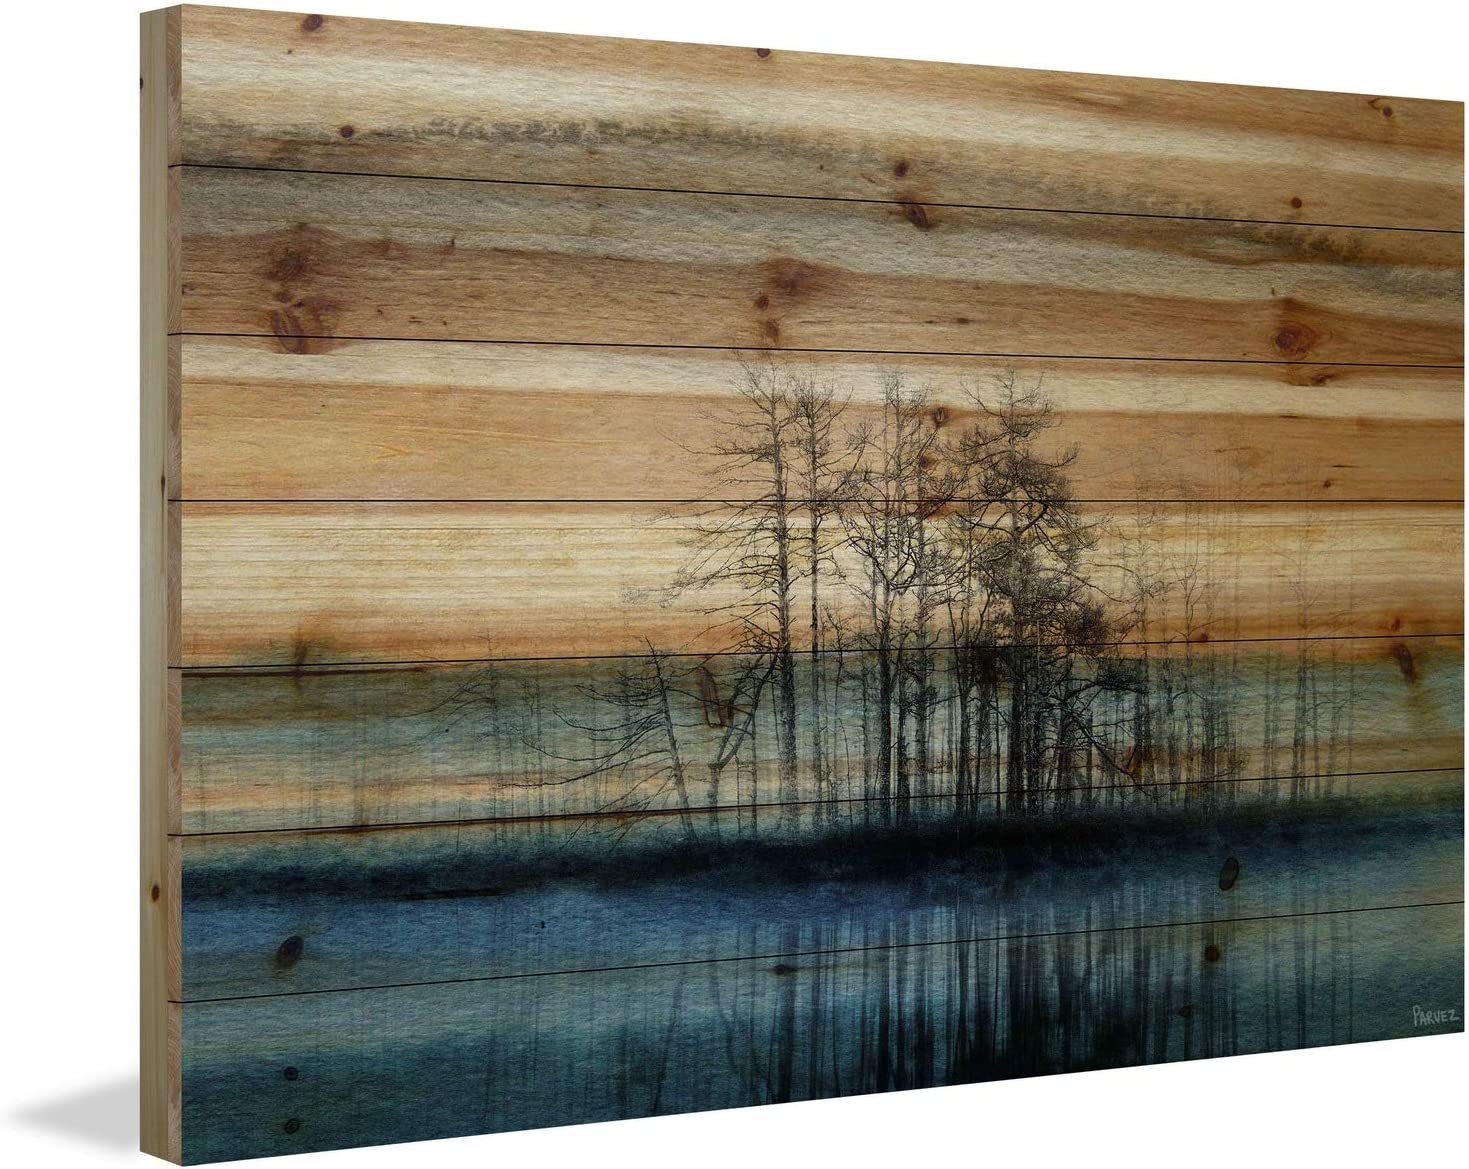 2021 autumn and winter new Parvez Taj Tree Isle Detroit Mall Reflects Painting Print Natural on Woo Pine